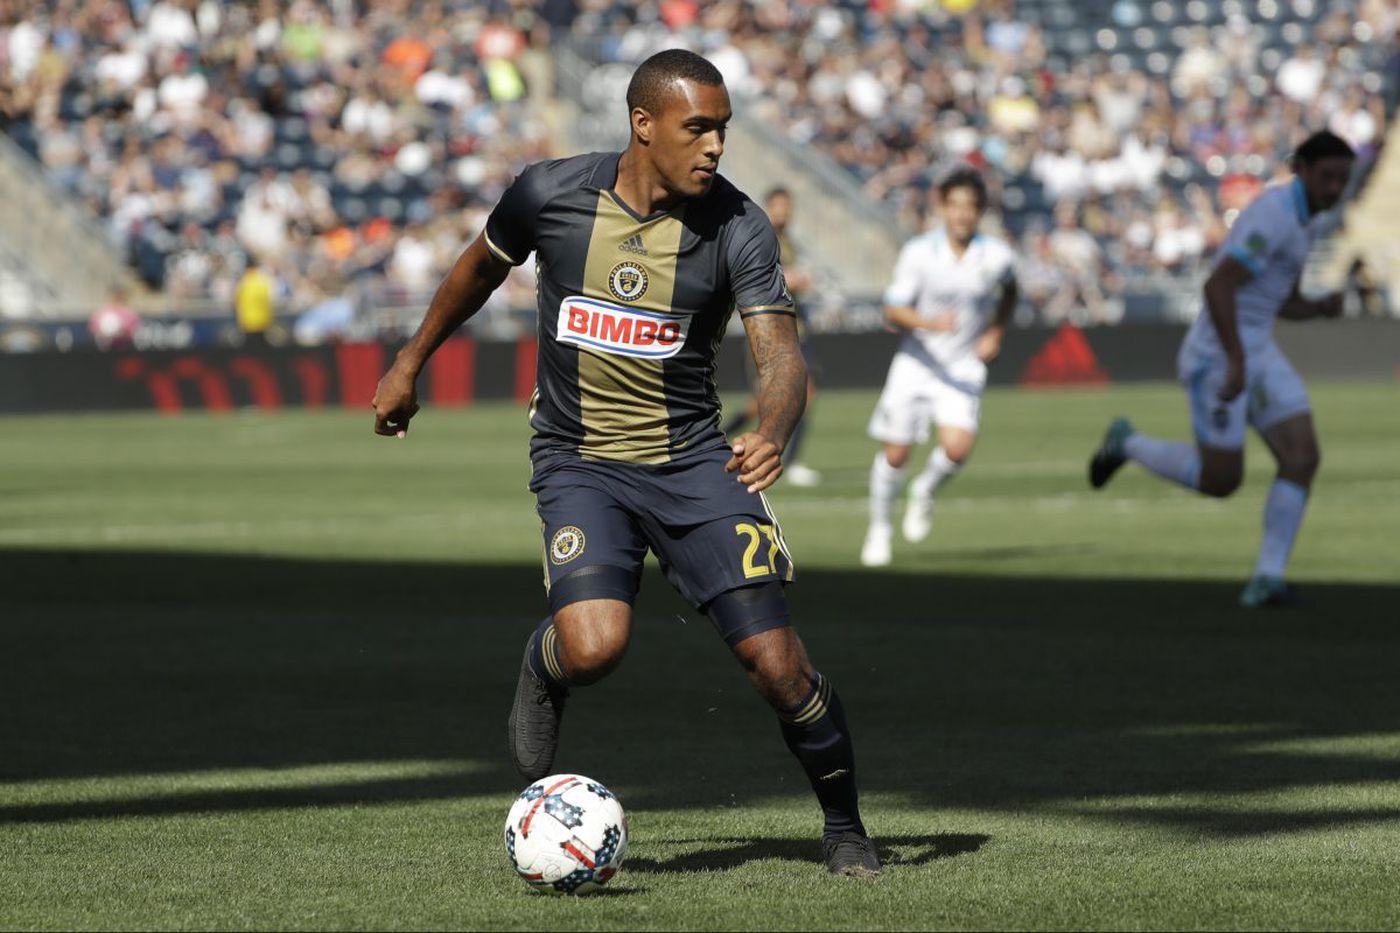 Fafa Picault or Jay Simpson could start for Union at striker vs. Real Salt Lake